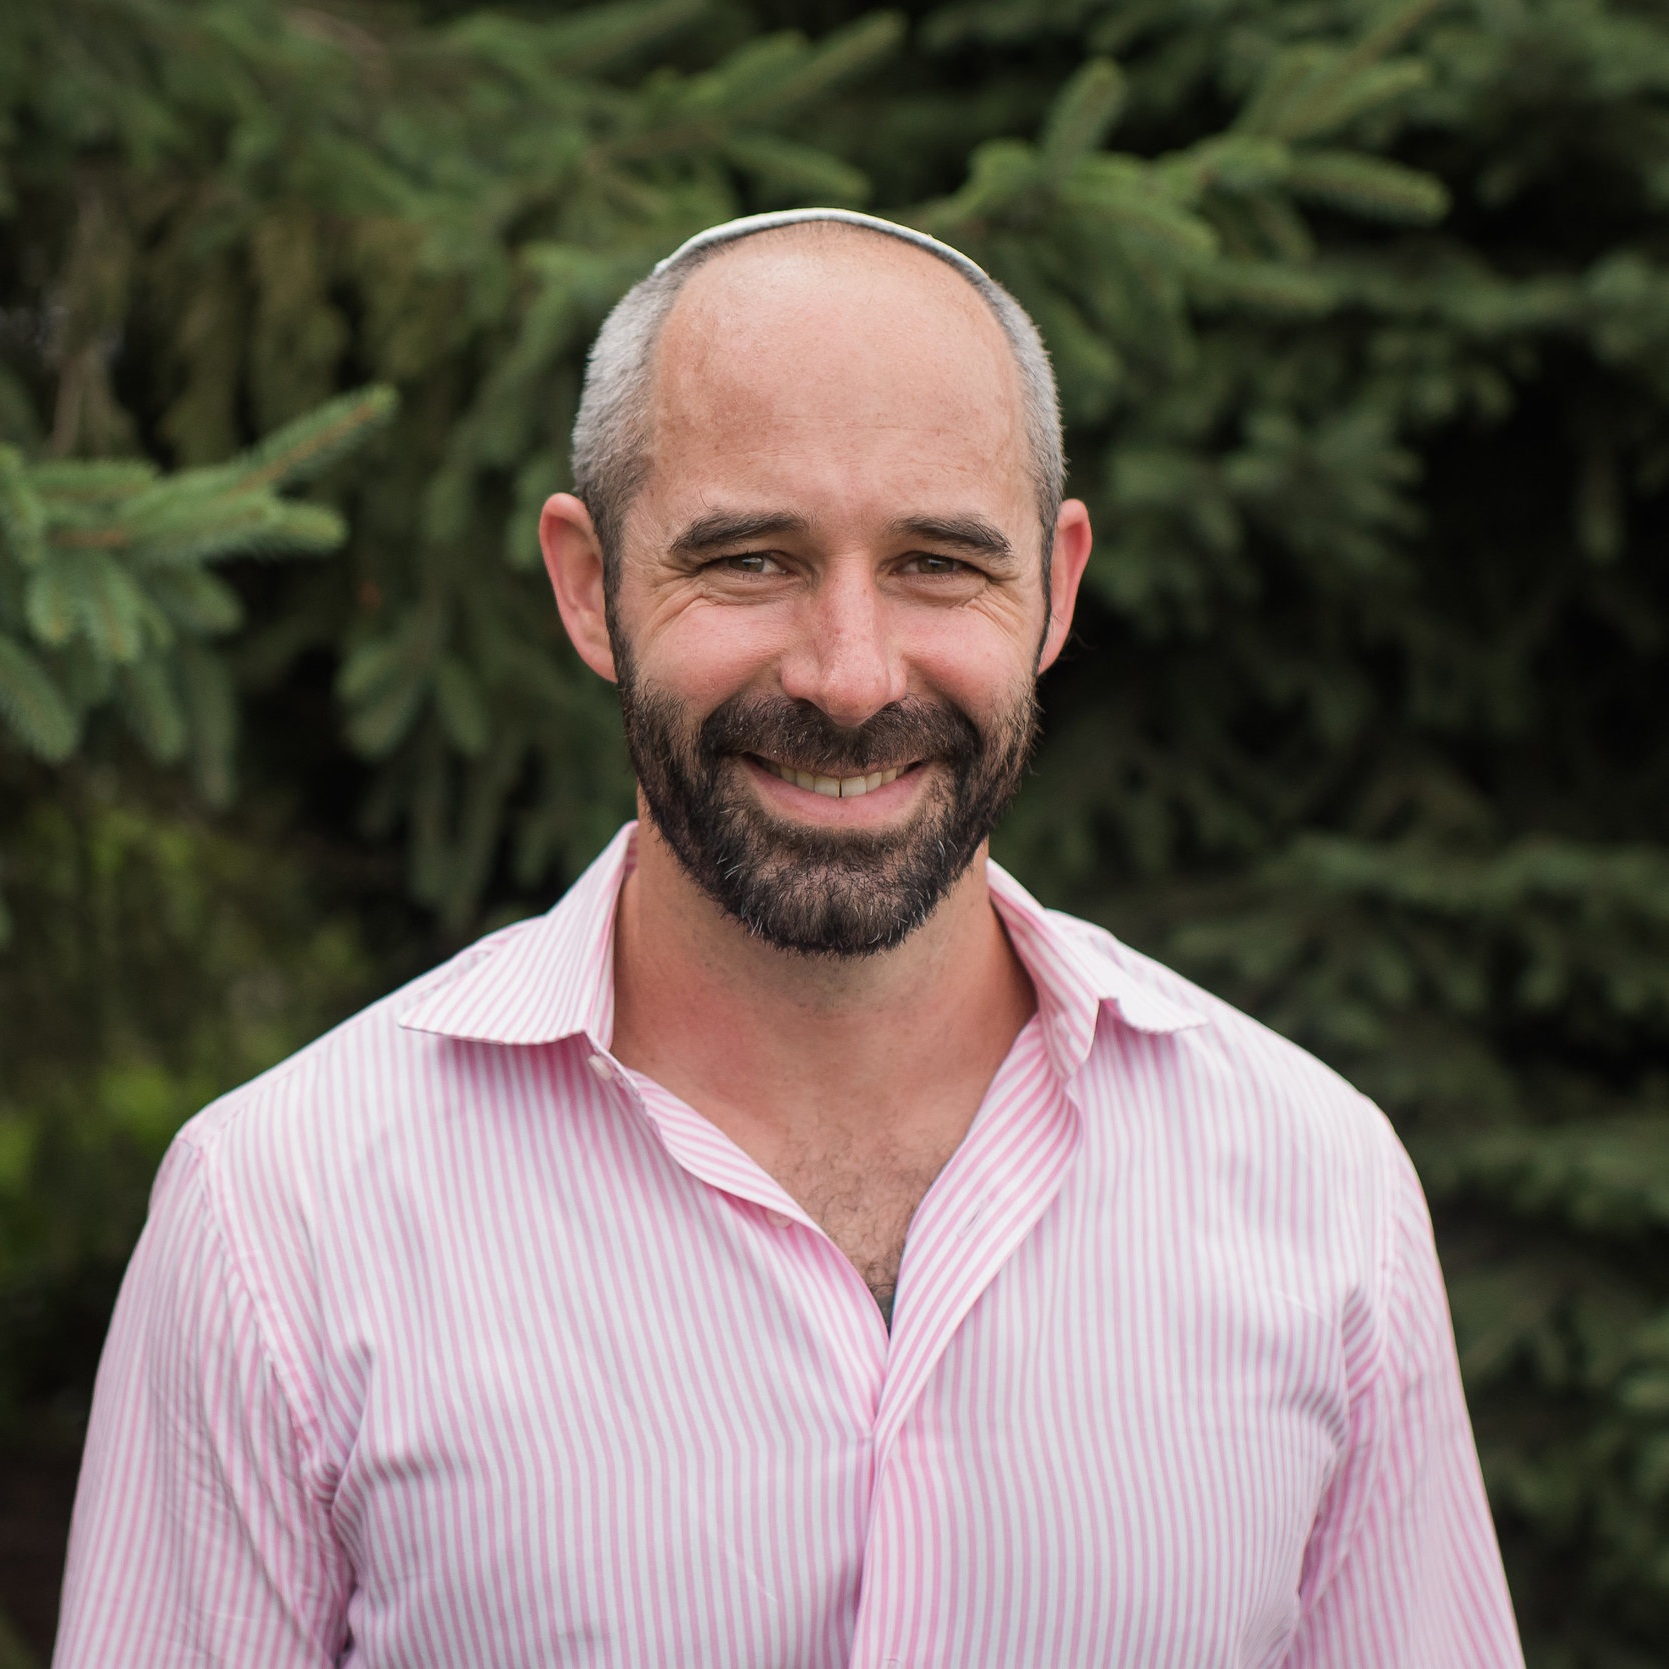 Rabbi Aaron, K20 graduate and senior rabbi in northern Virginia